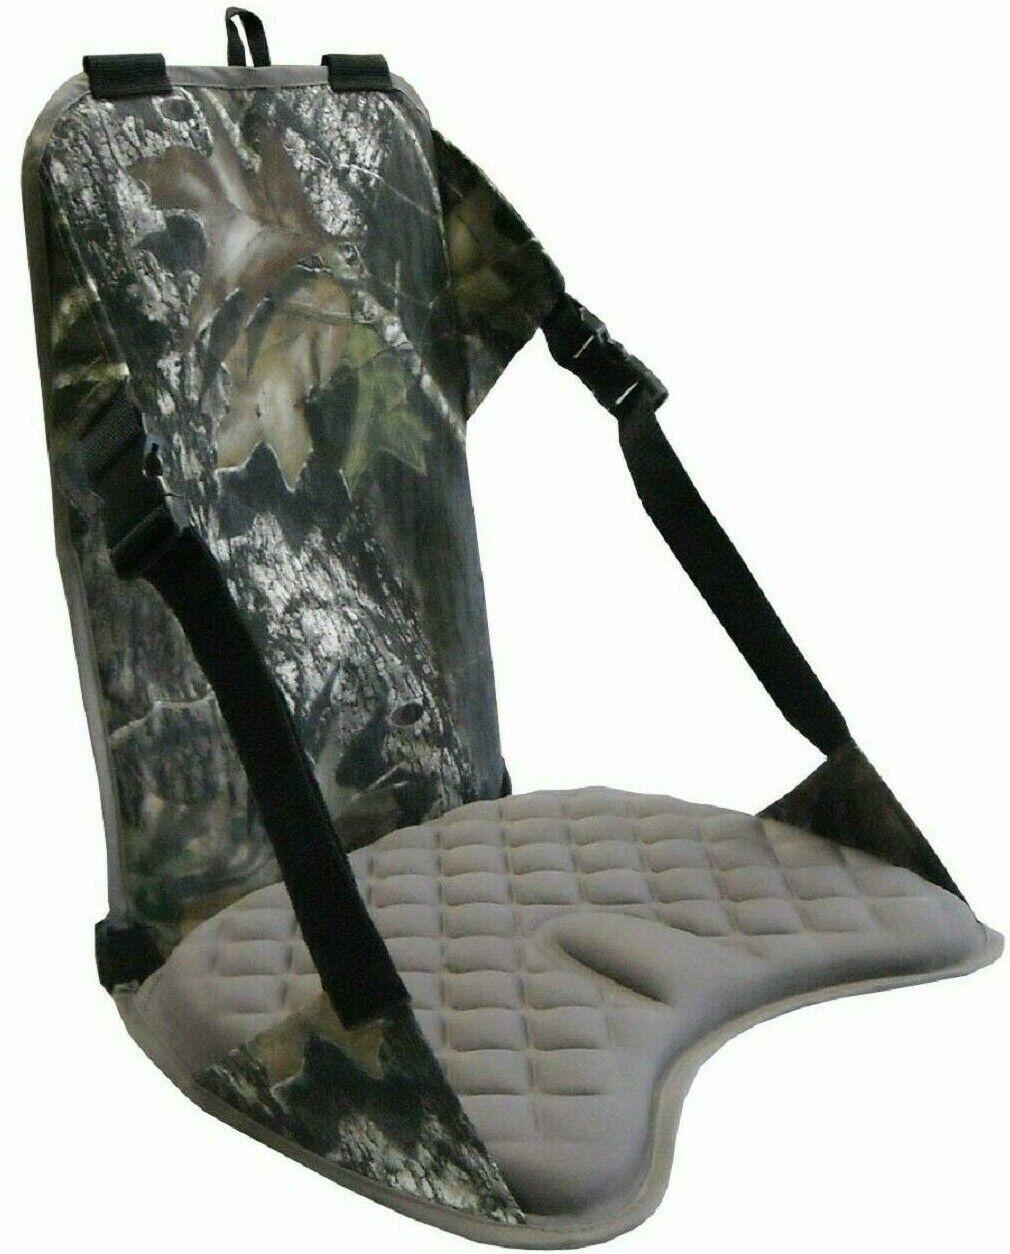 Beard Buster EZ Chair Camo Hunting Blind Cushion Outdoor Camping Trek Sports-